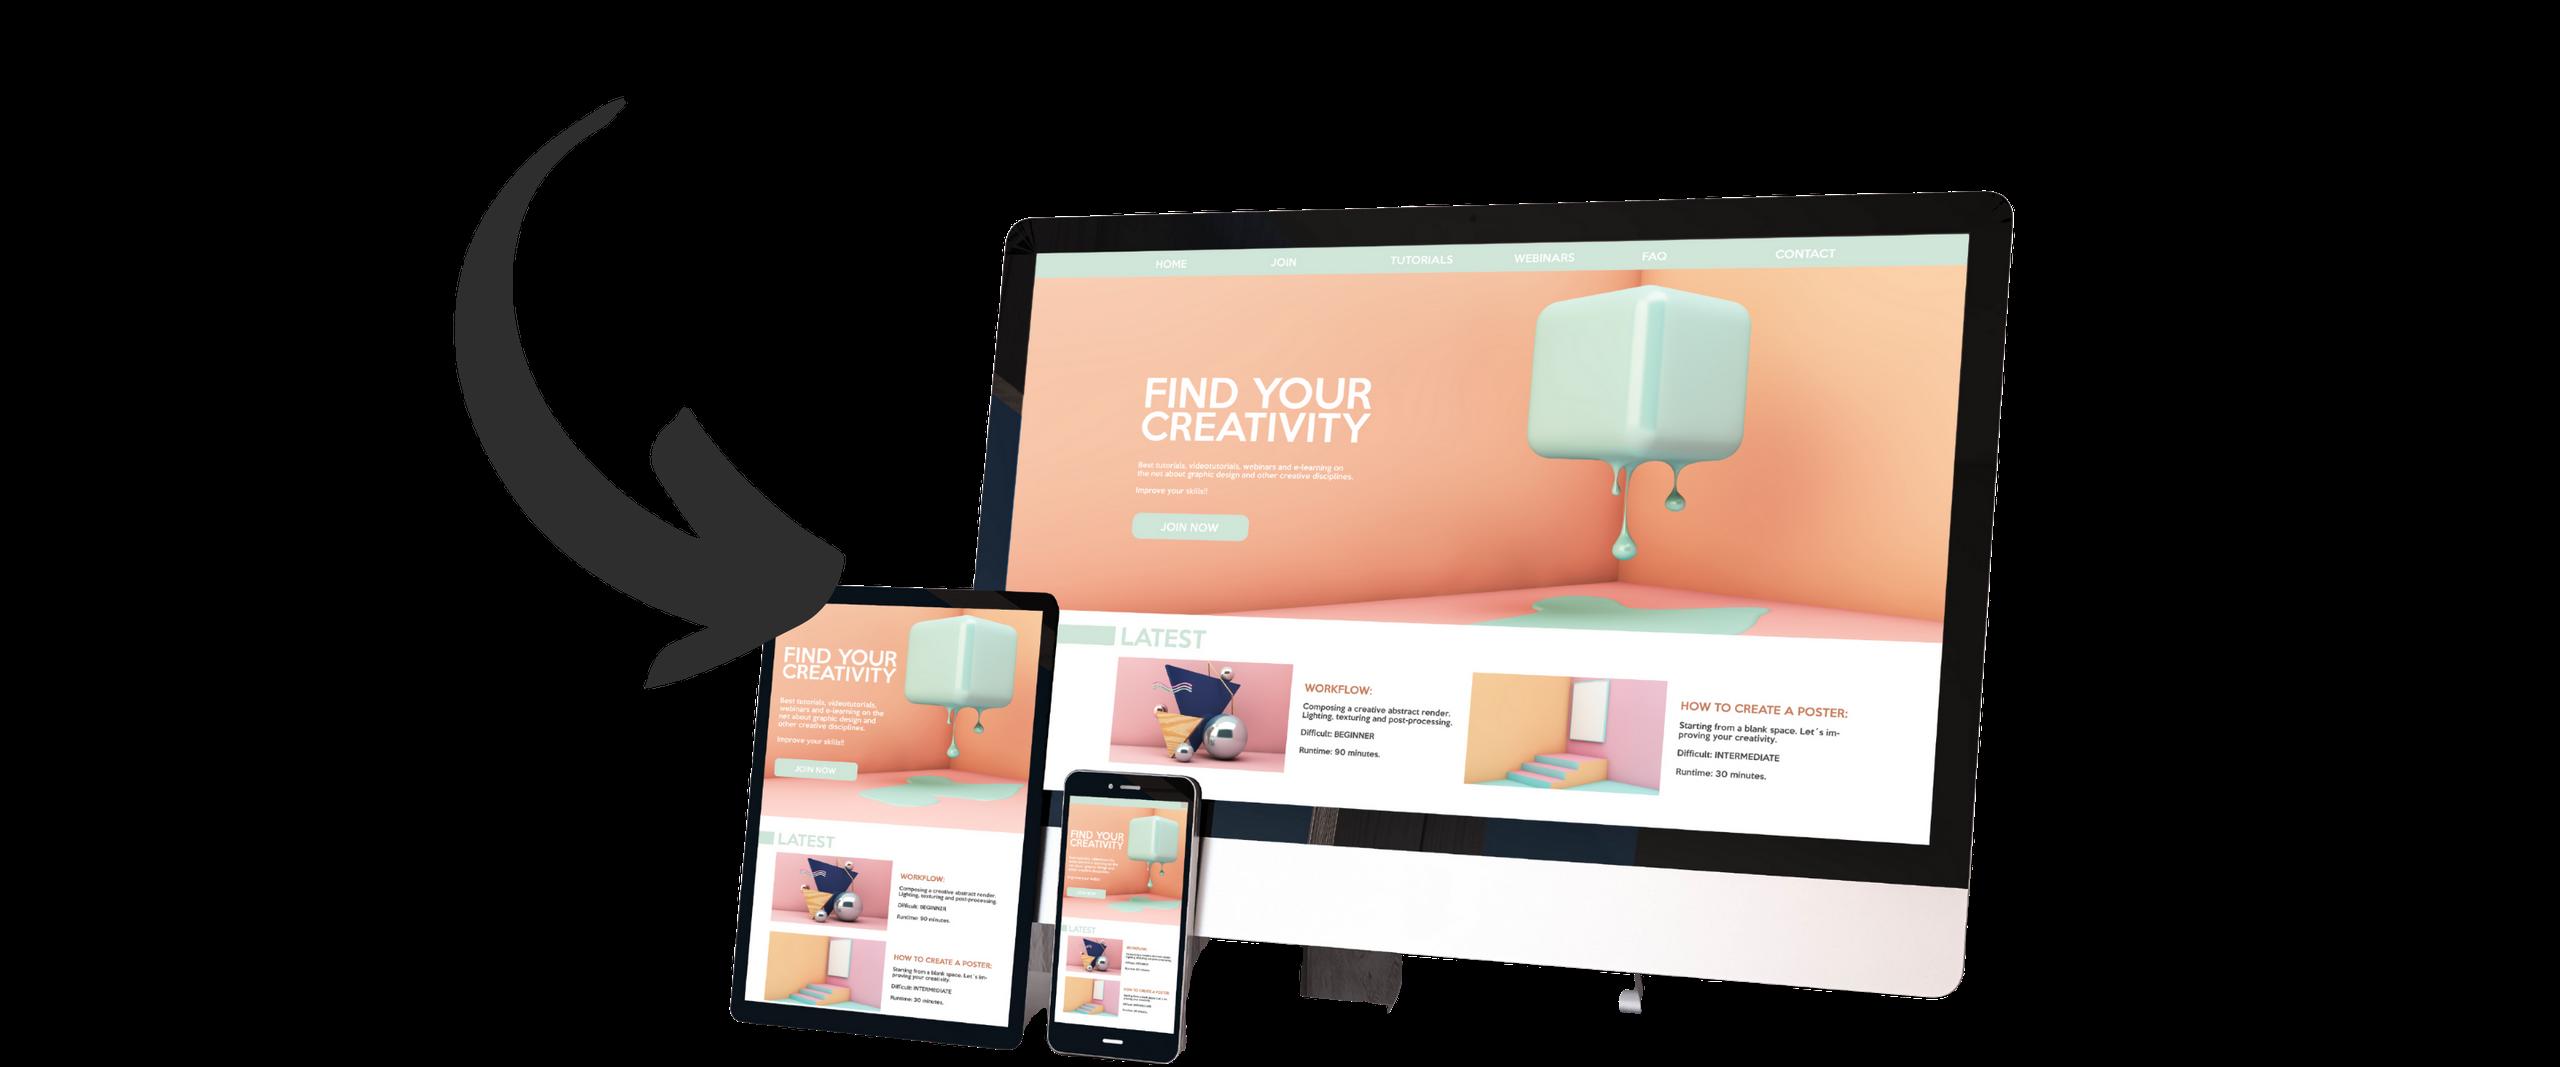 Virtual Summit Mastermind Program displayed on various devices